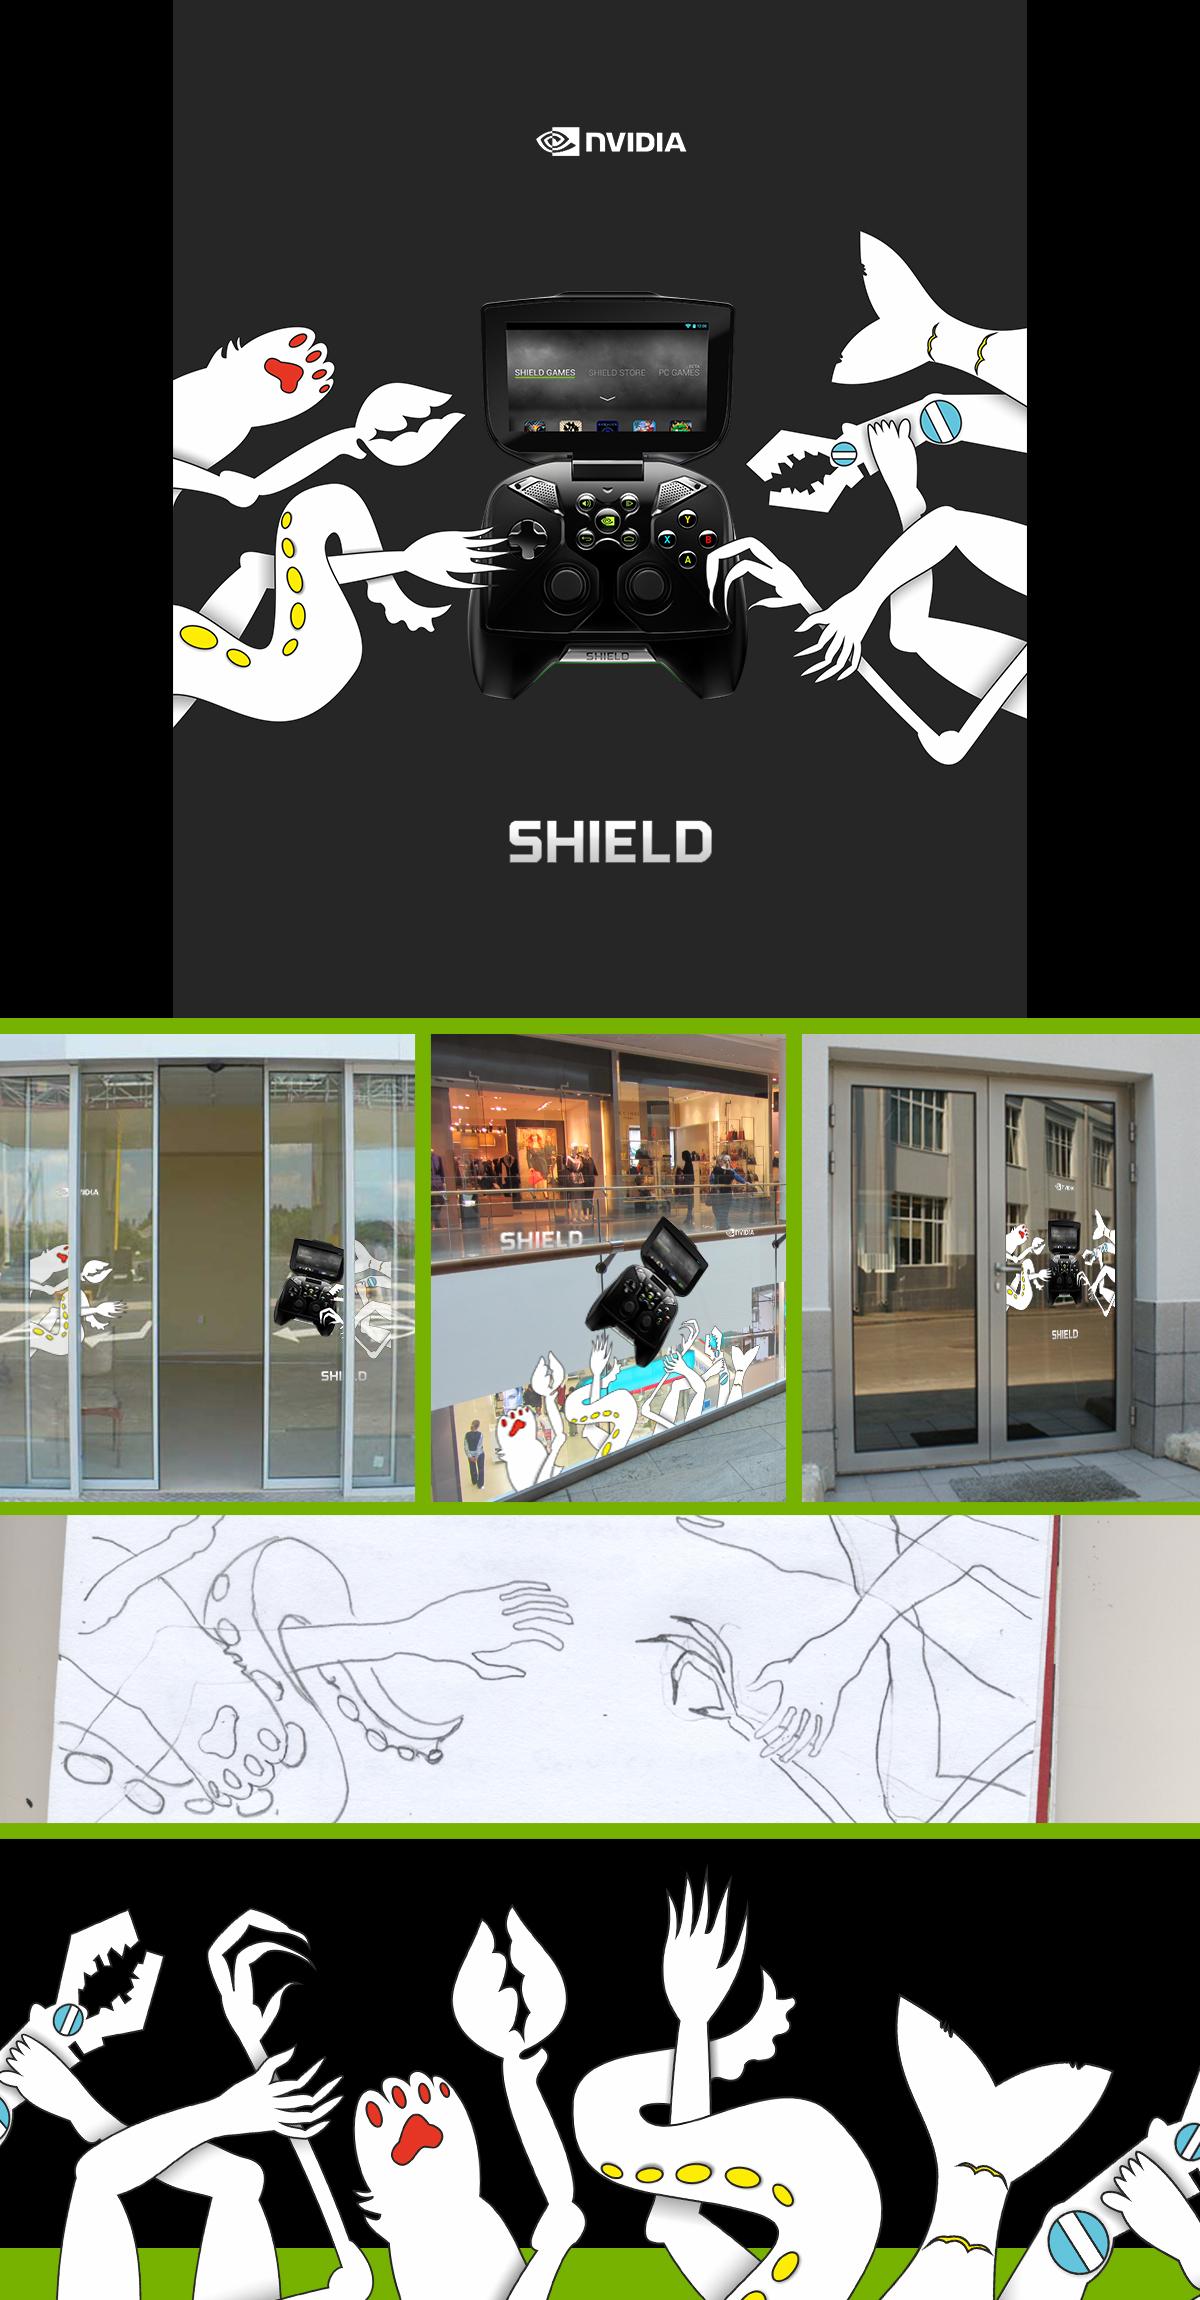 nvidia_shield_v02.jpg